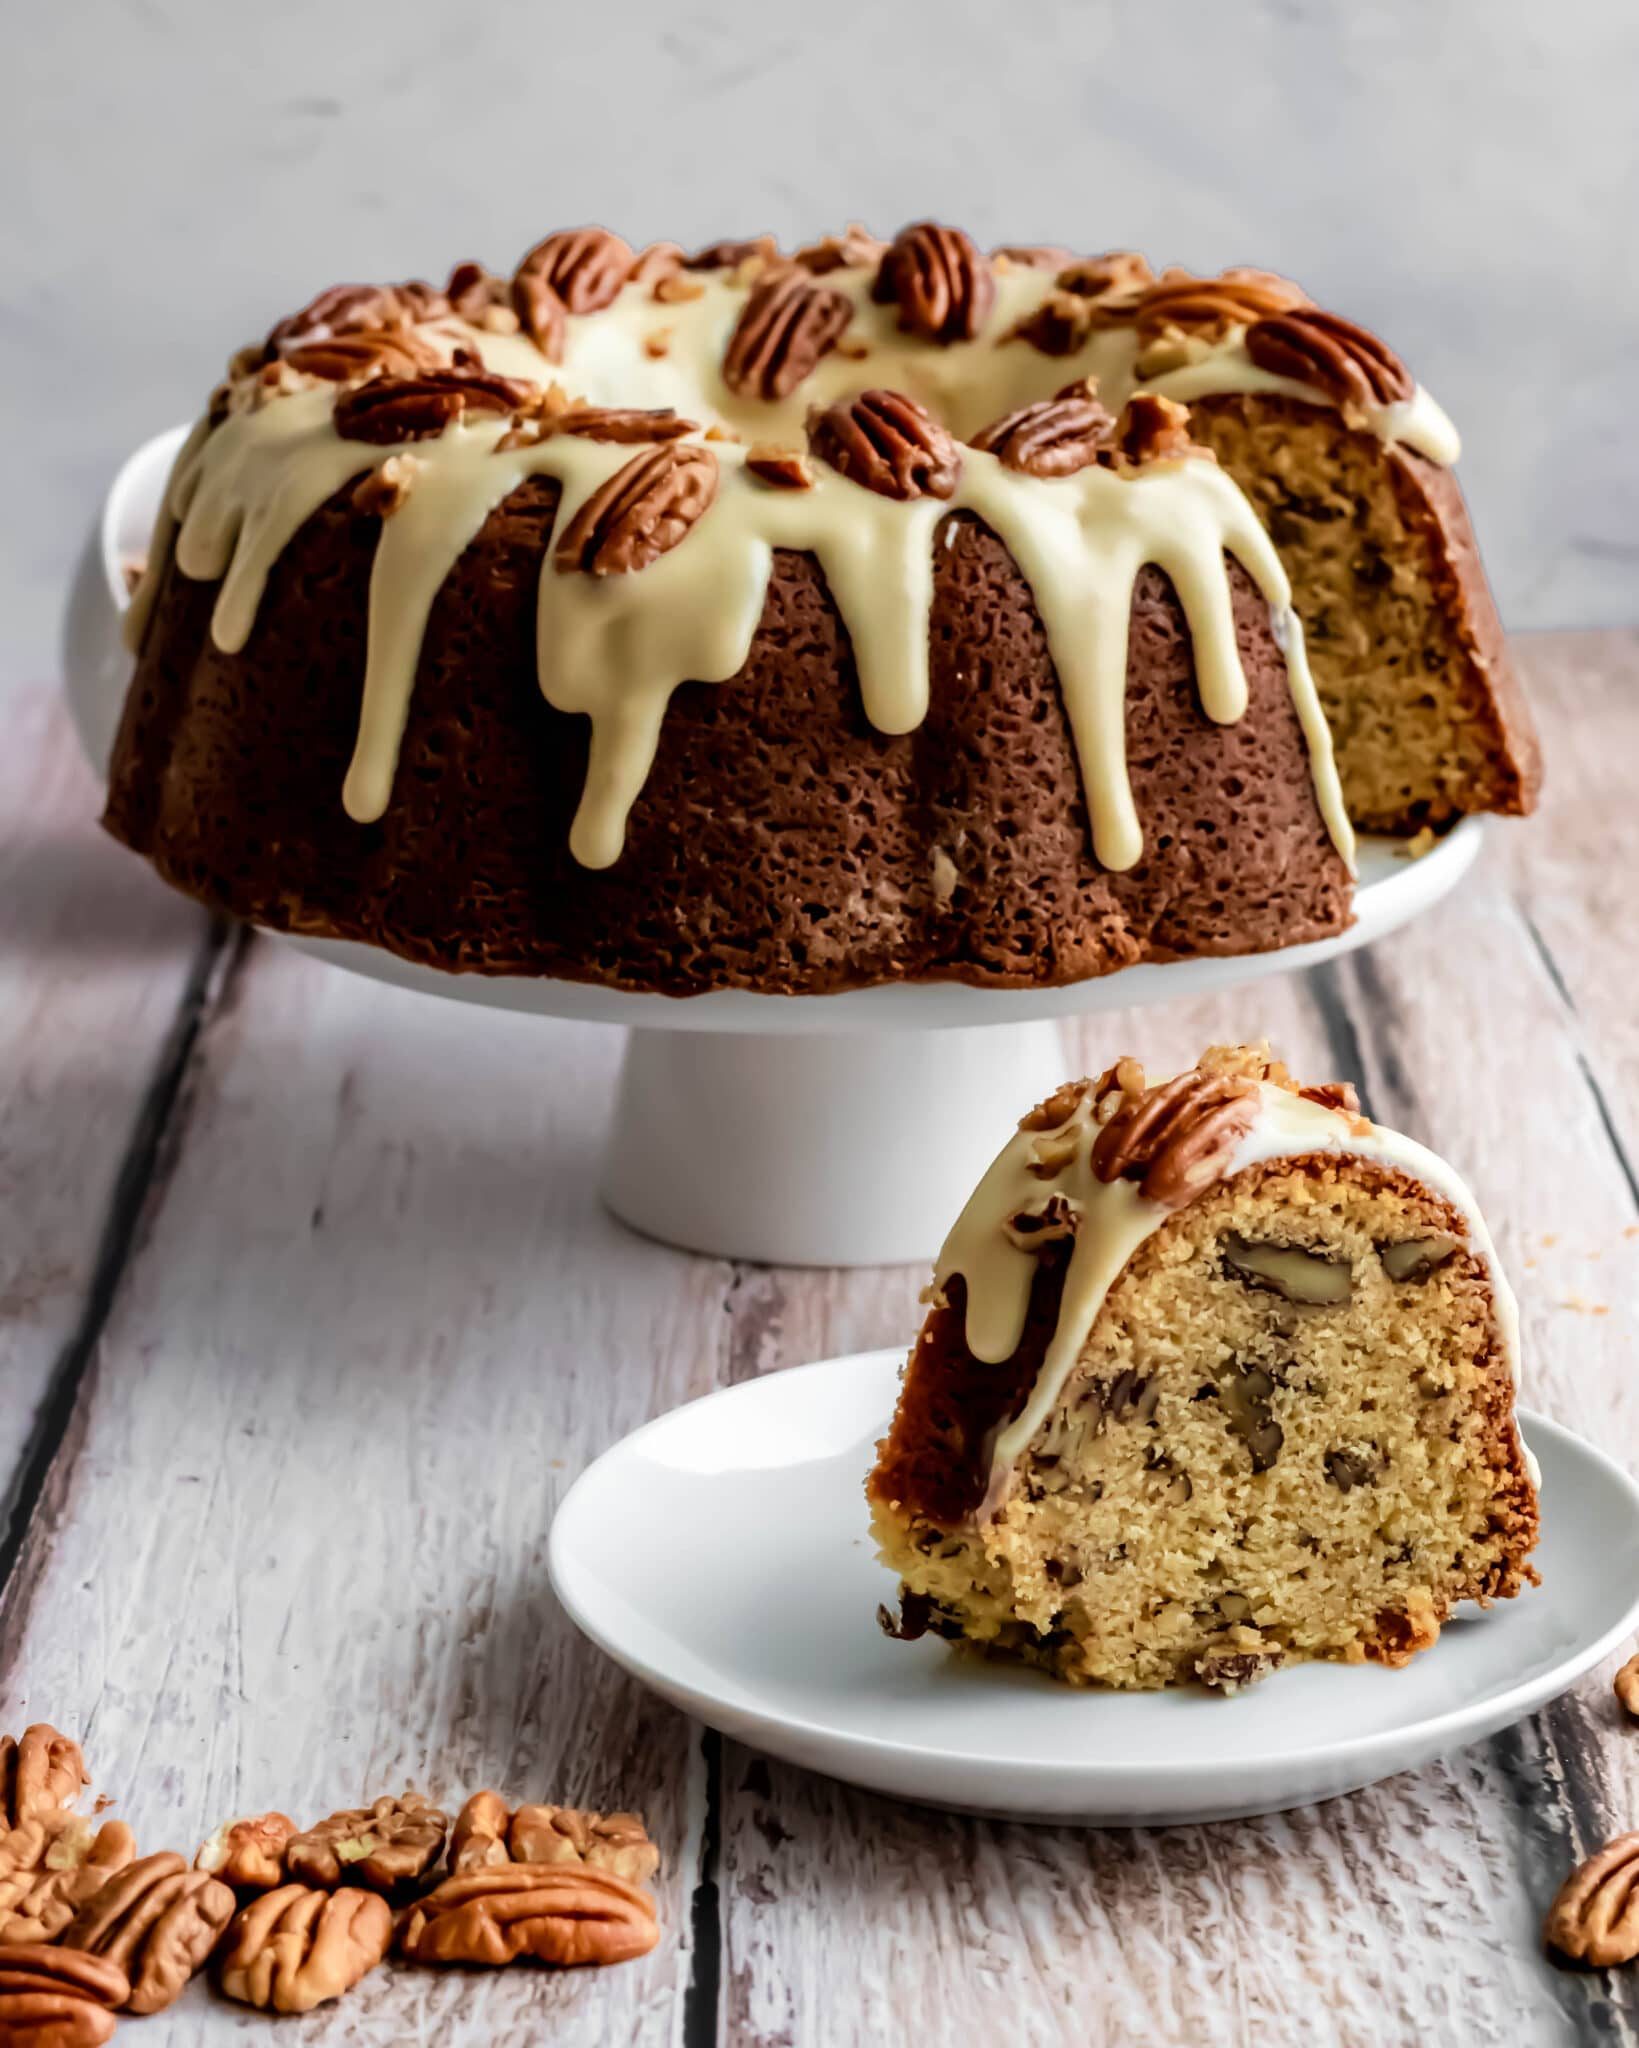 Maple Pecan Bundt Cake